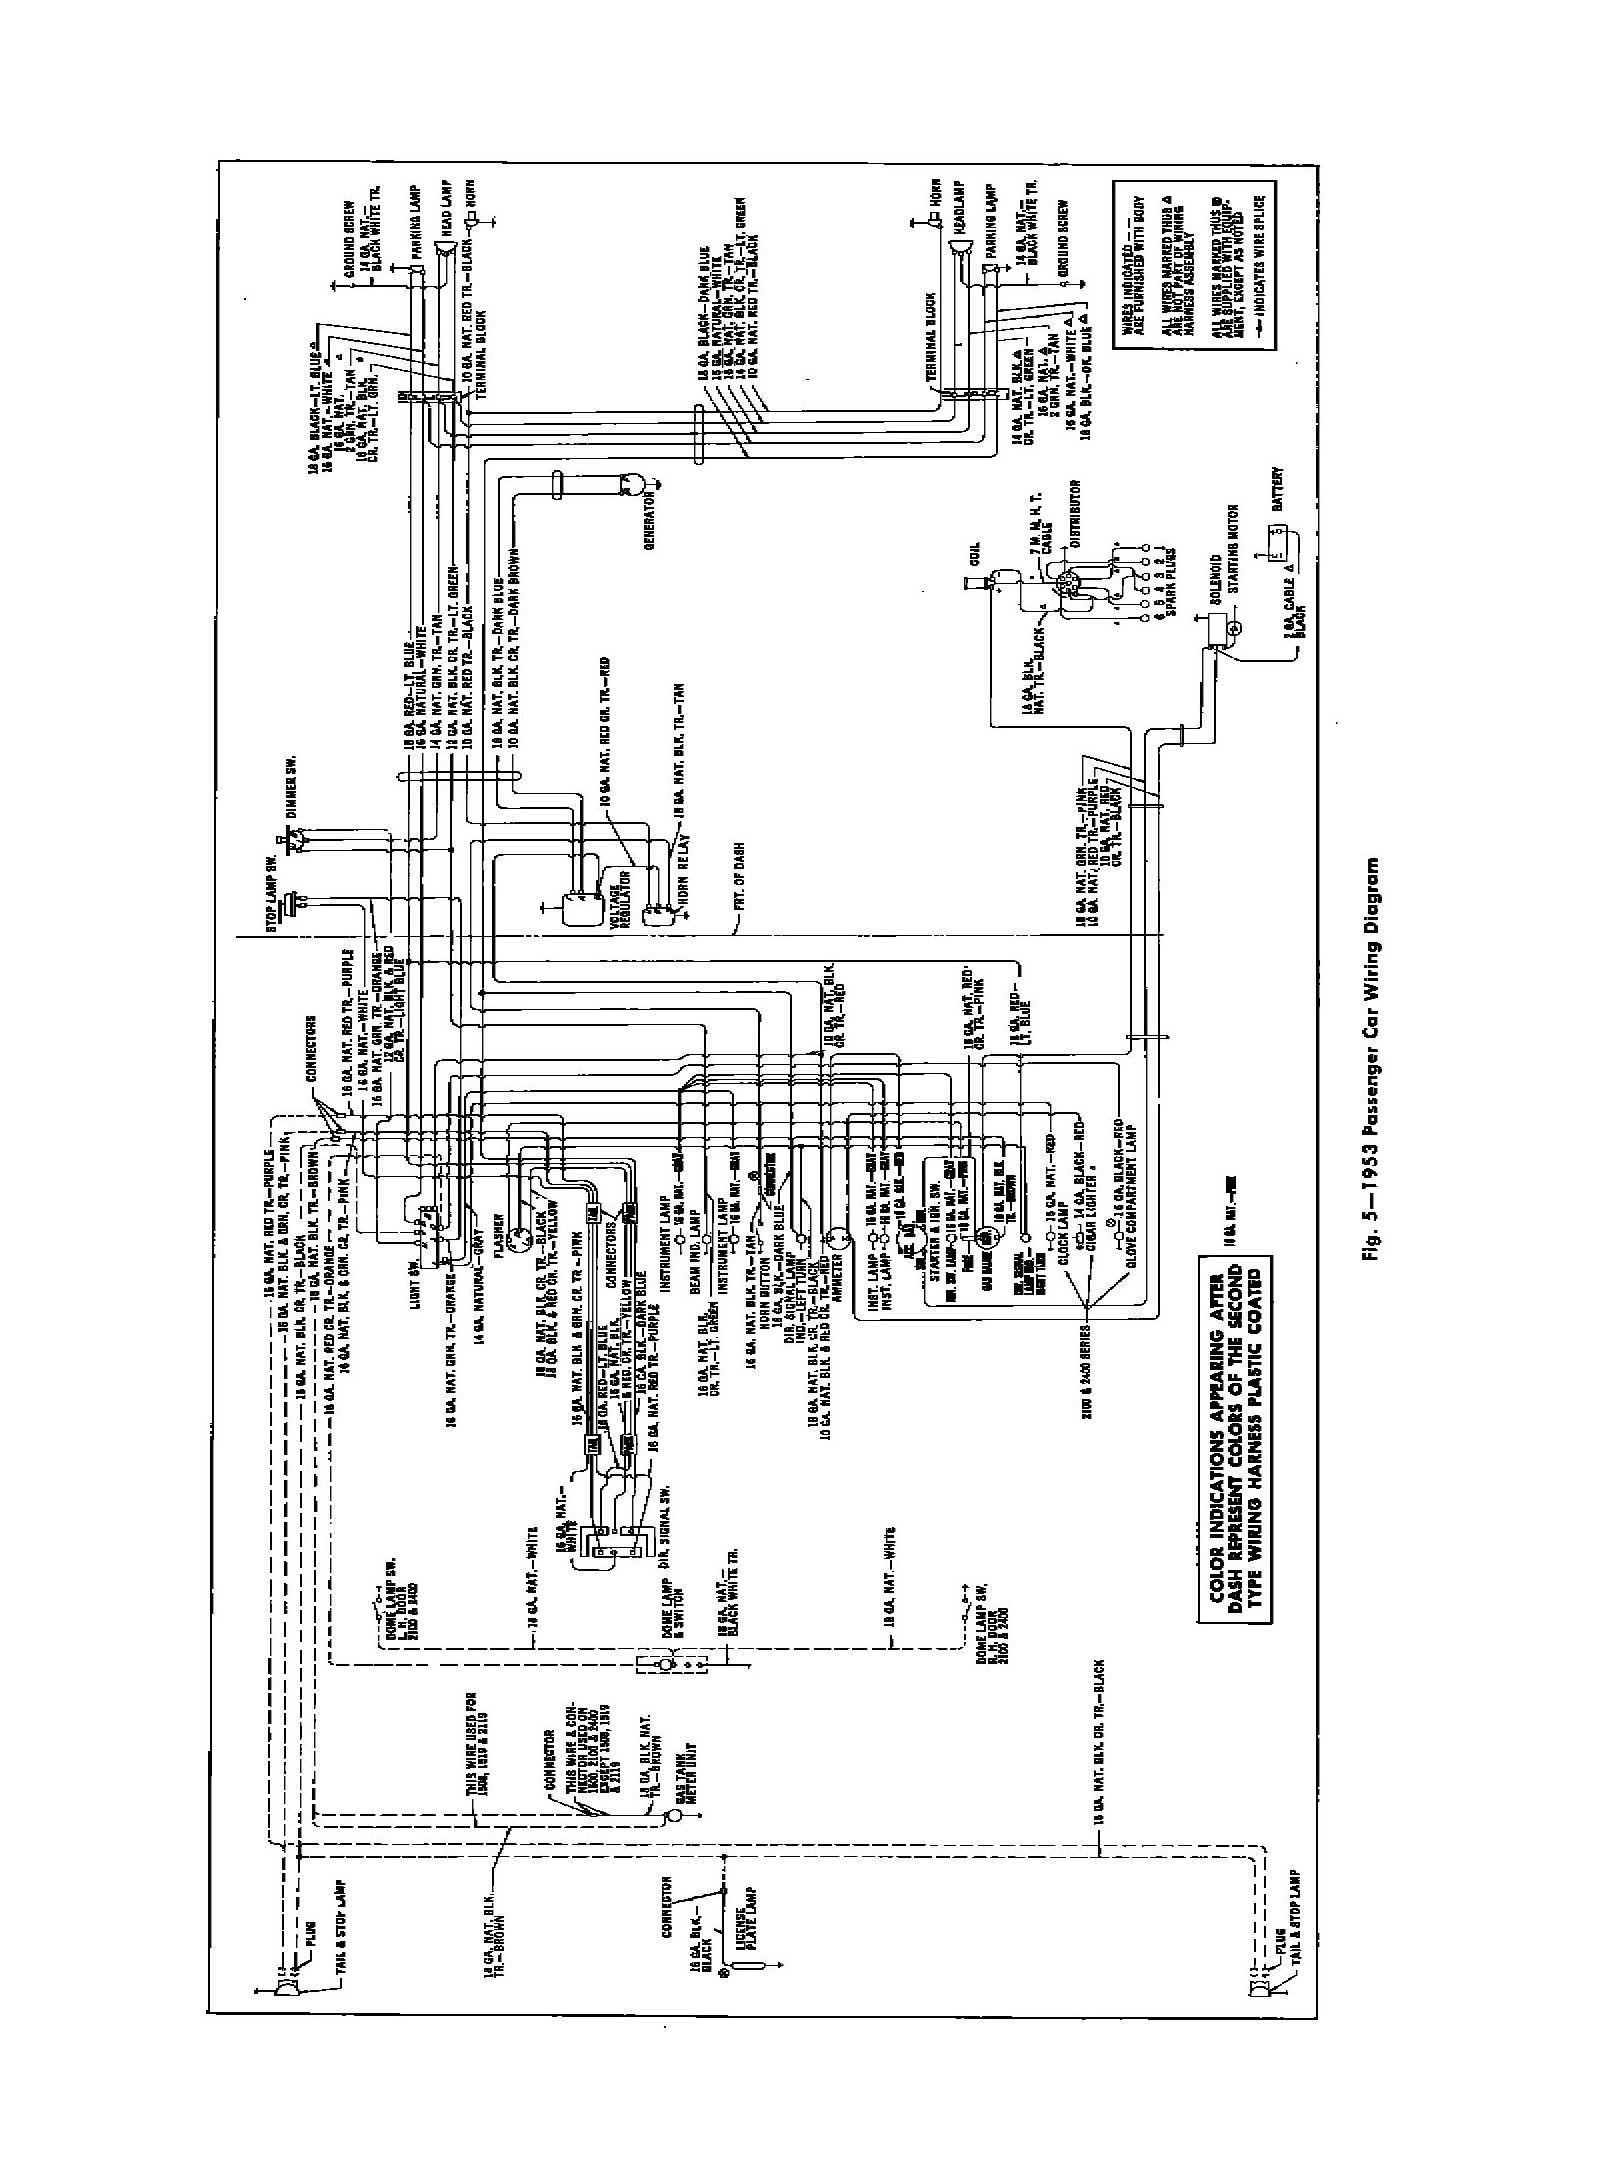 1953 Chevy Truck Wiring Diagram Chevy Wiring Diagrams Of 1953 Chevy Truck Wiring Diagram